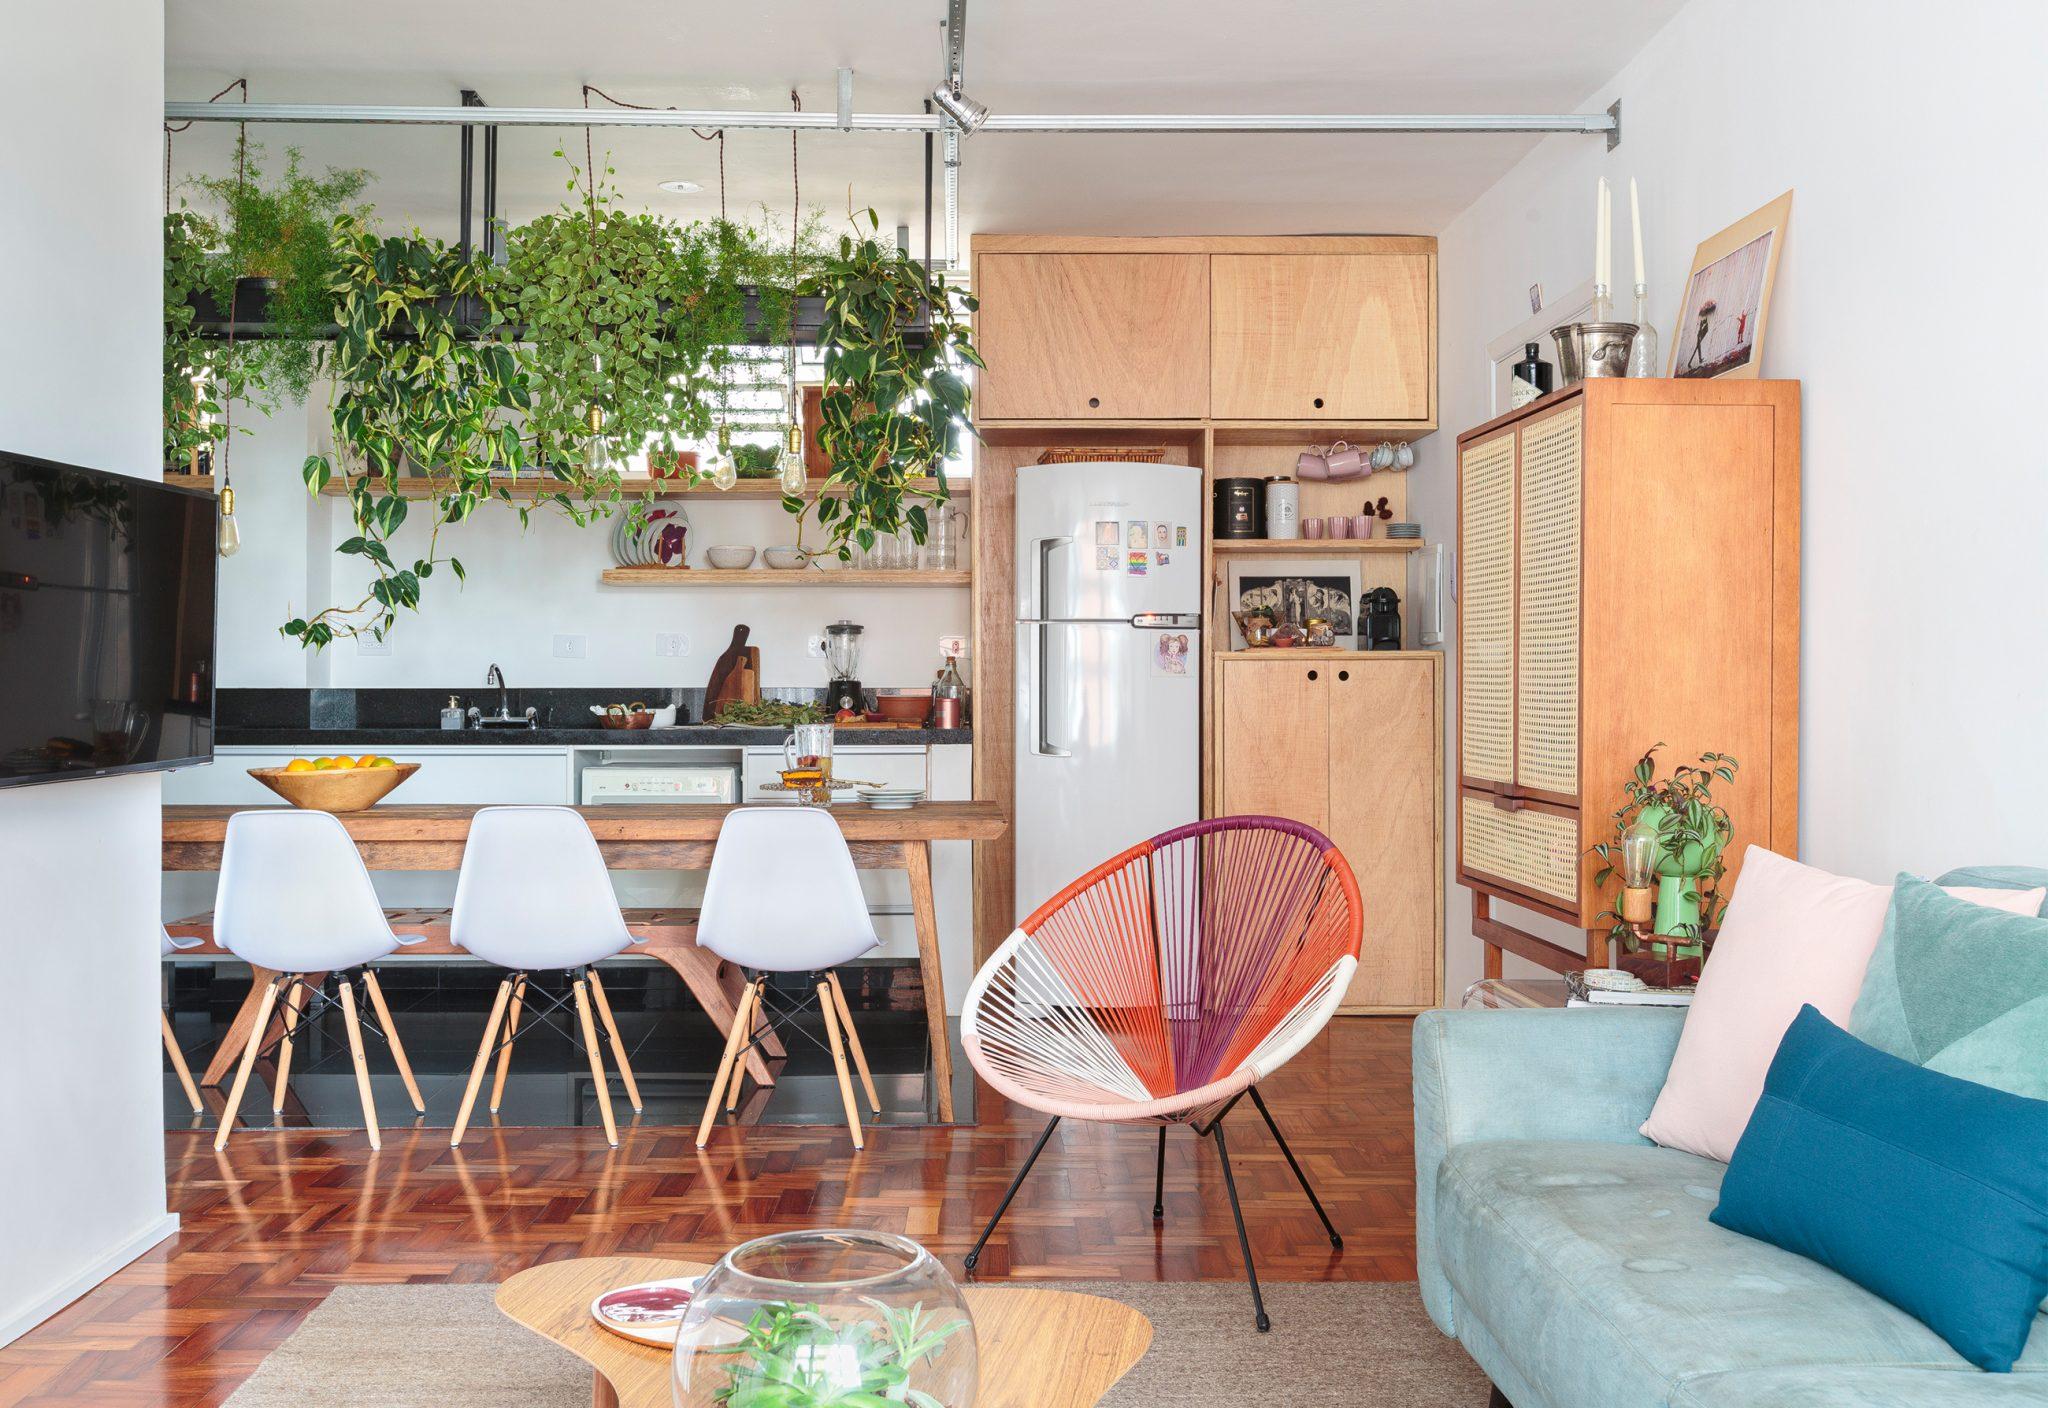 -lala-decoracao-ap-artigas-13-sala-cozinha-piso-taco-madeira-sofa-azul-mesa-centro-curva-madeira-calra-armario-palhinha-mesa-banco-madeira-cadeira-eames-branca-cadeira-acapulco-colorida-plantas-suspensas